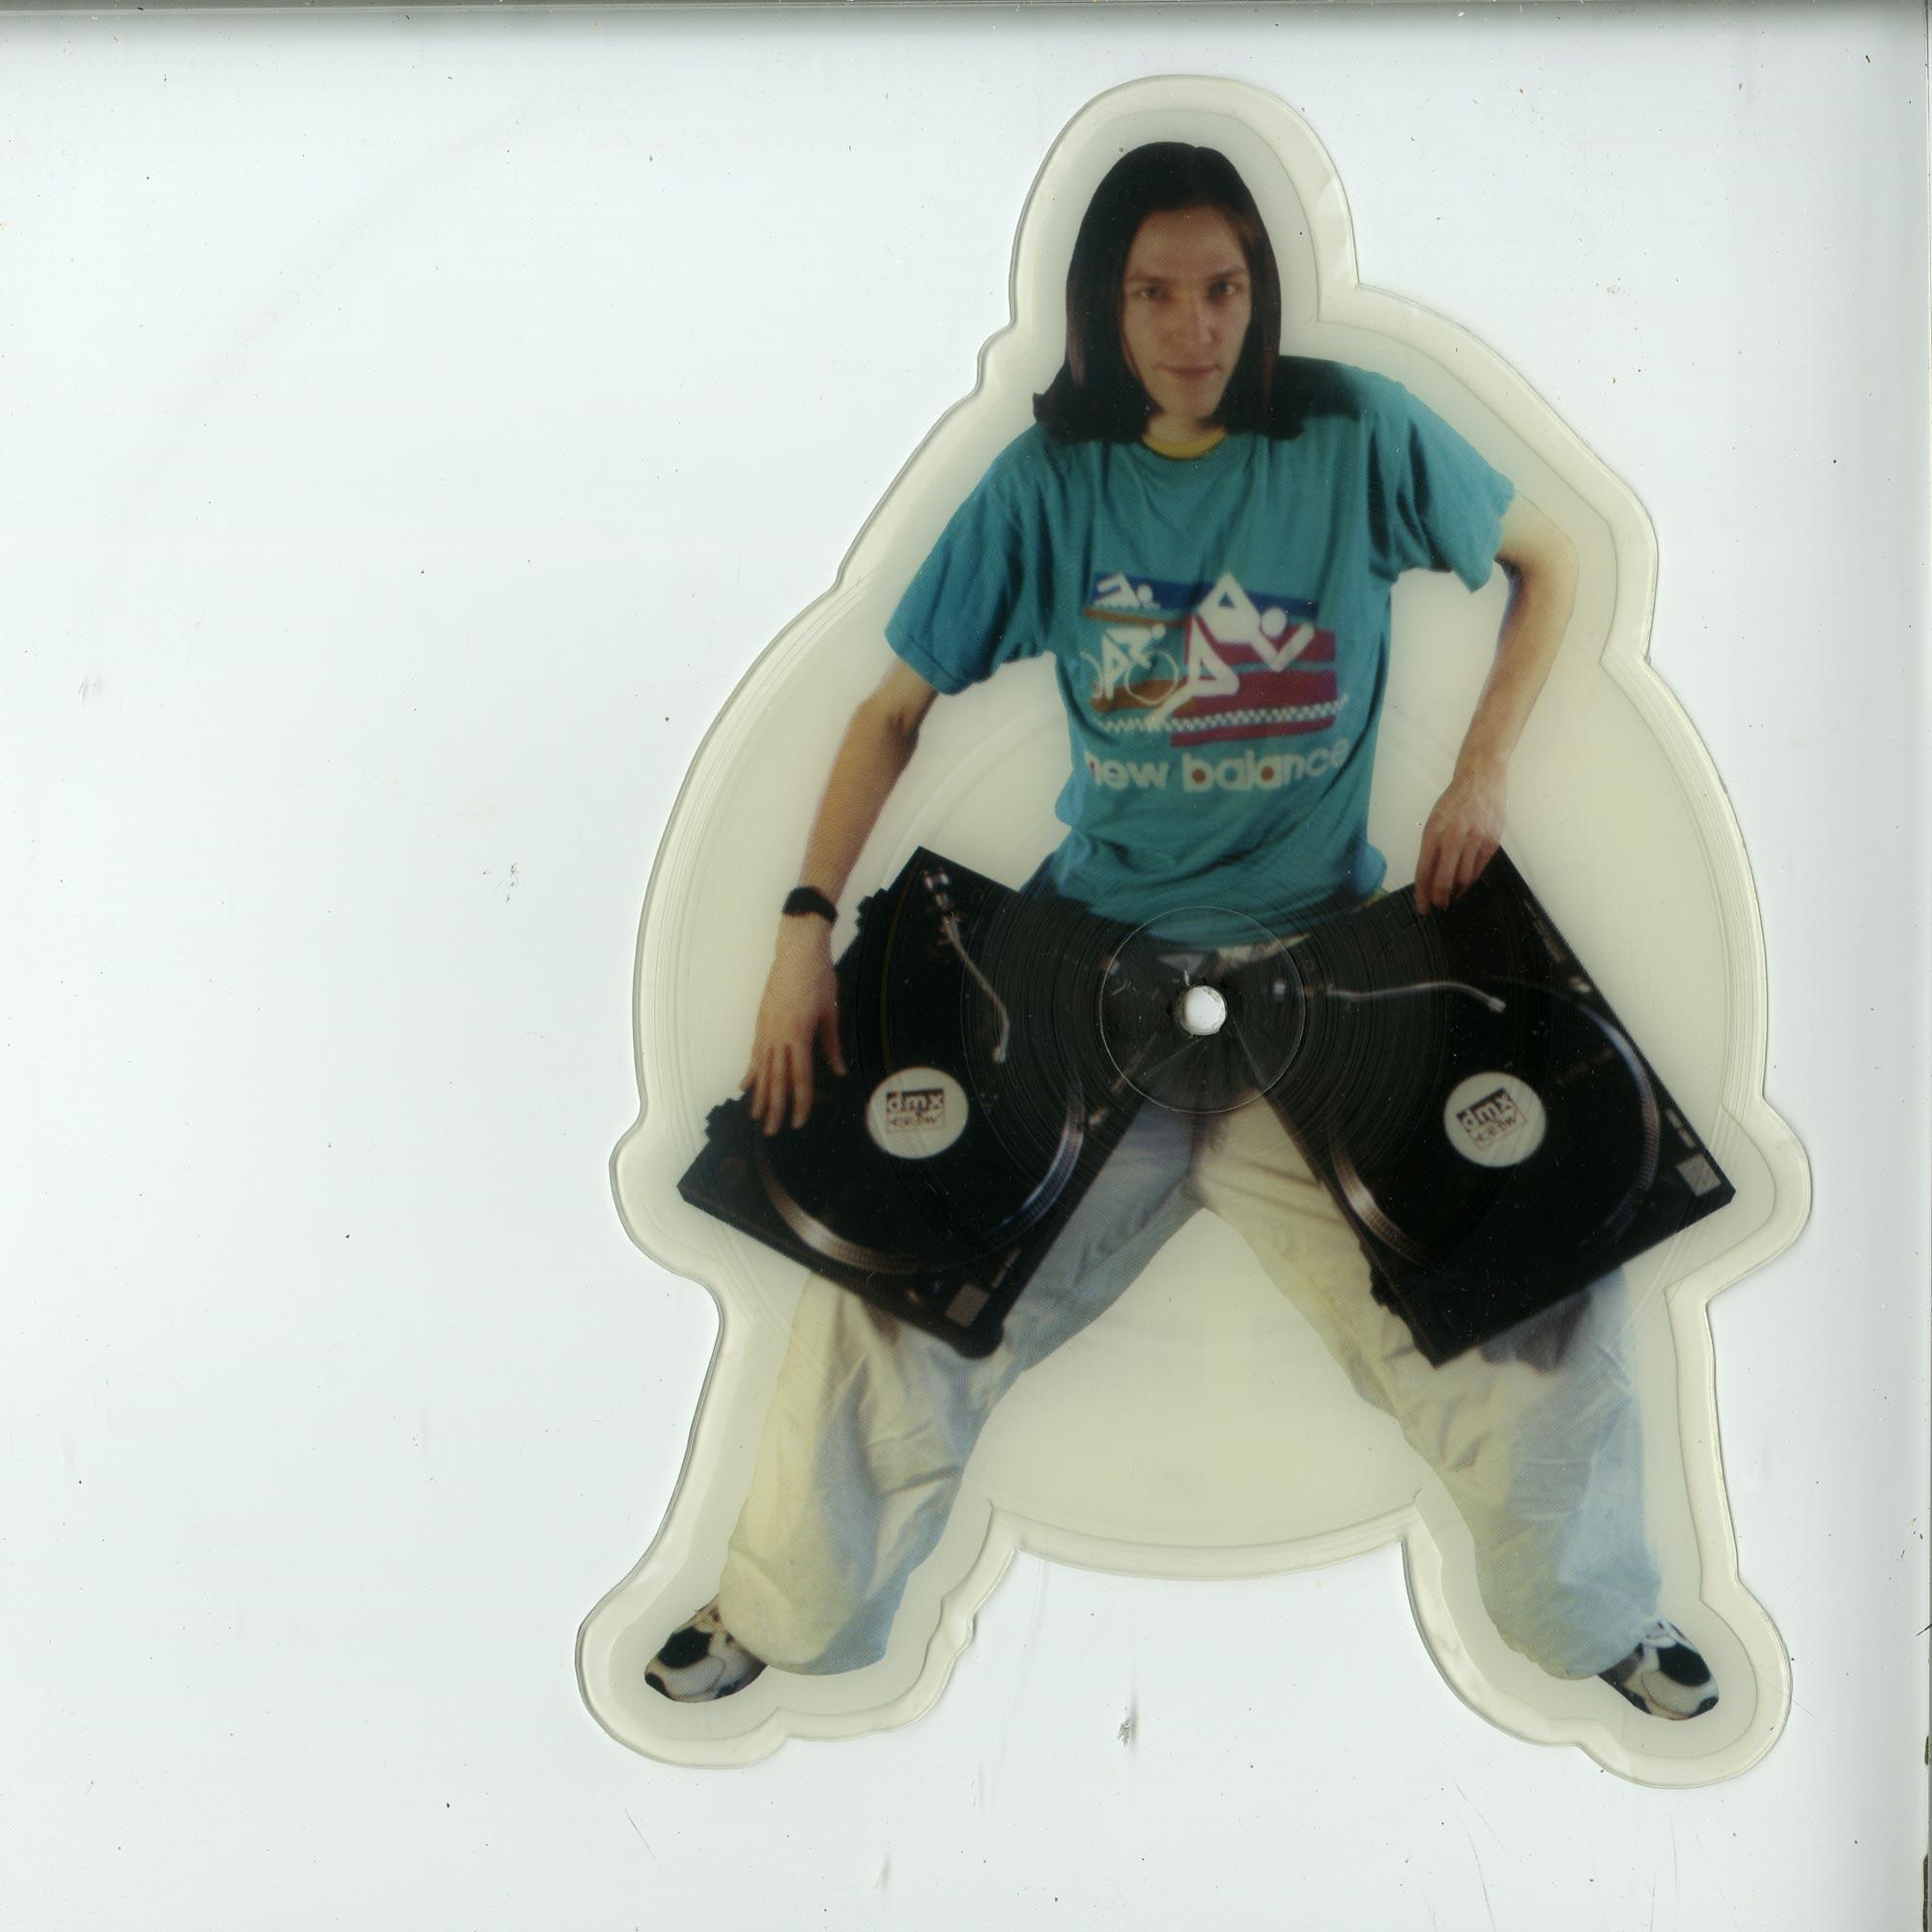 DMX Krew - GOOD TIME GIRL / DENKI NO MERODI